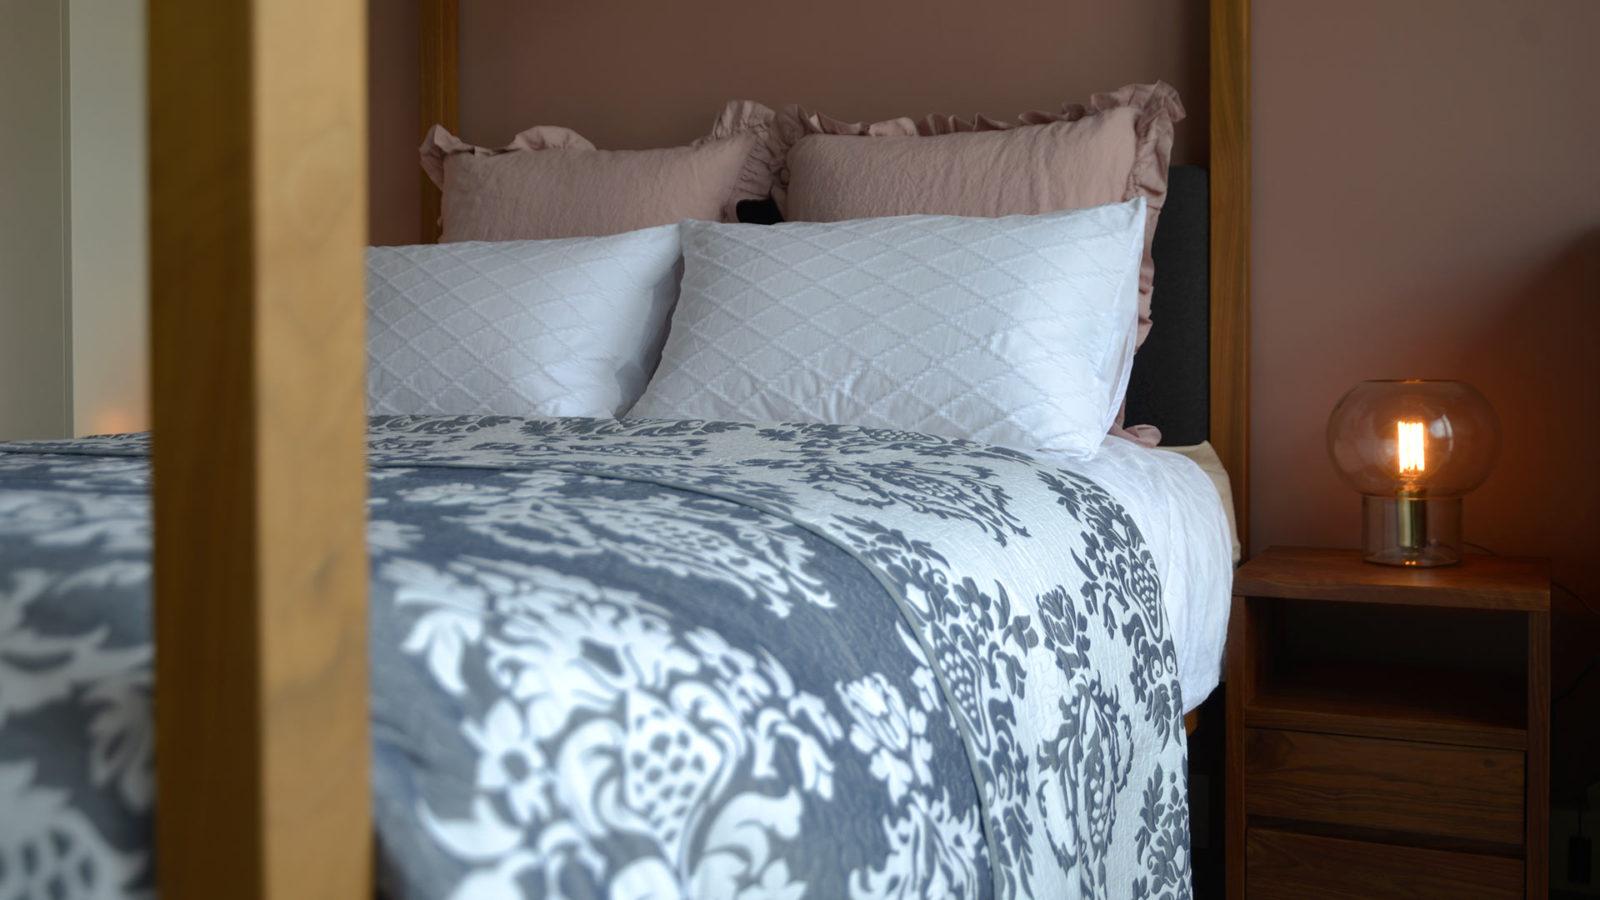 blue and ivory jacquard bedspread